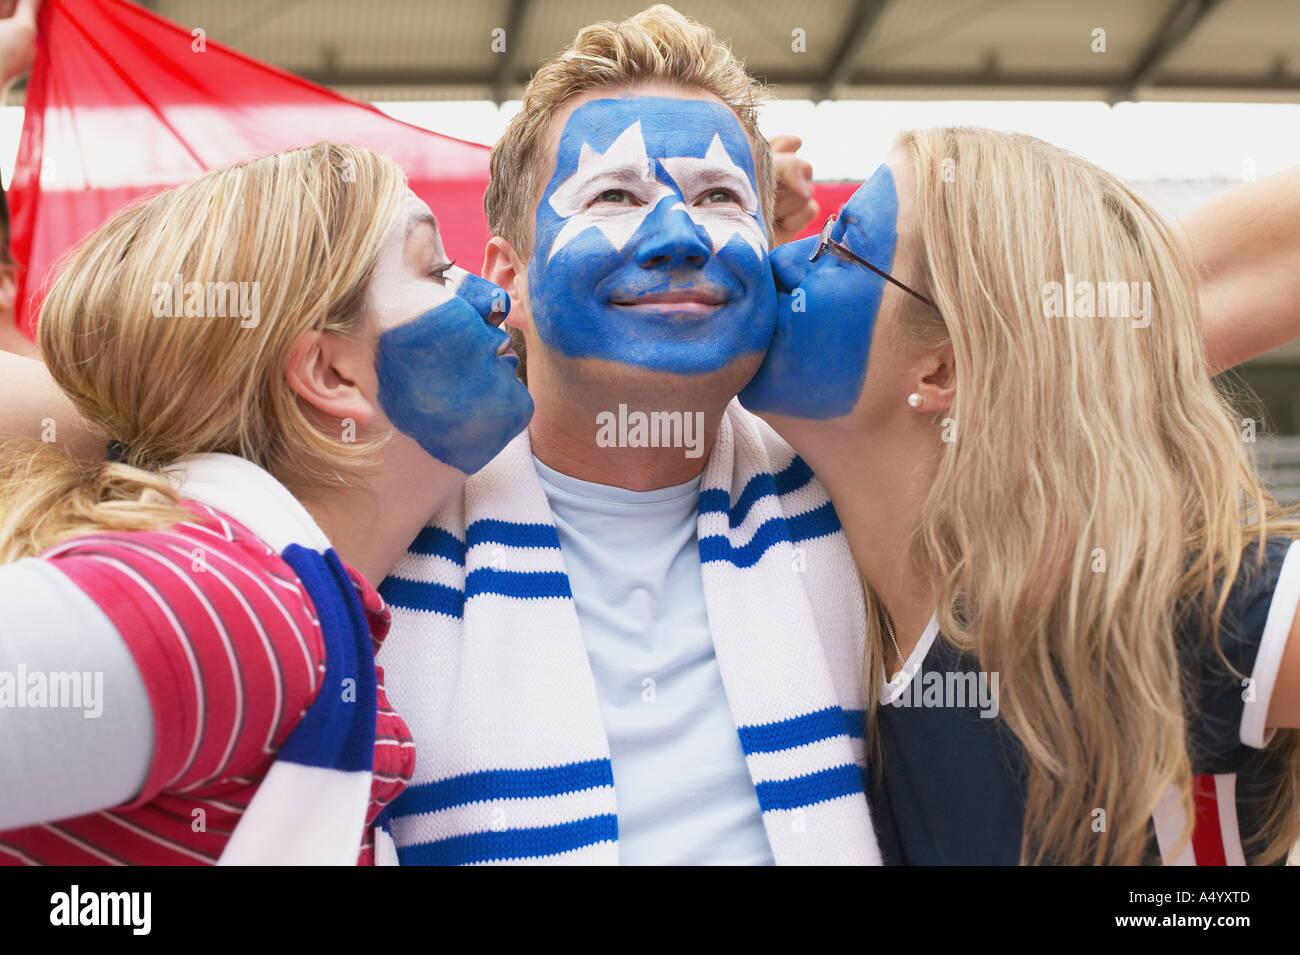 Les partisans de football s'embrasser Photo Stock